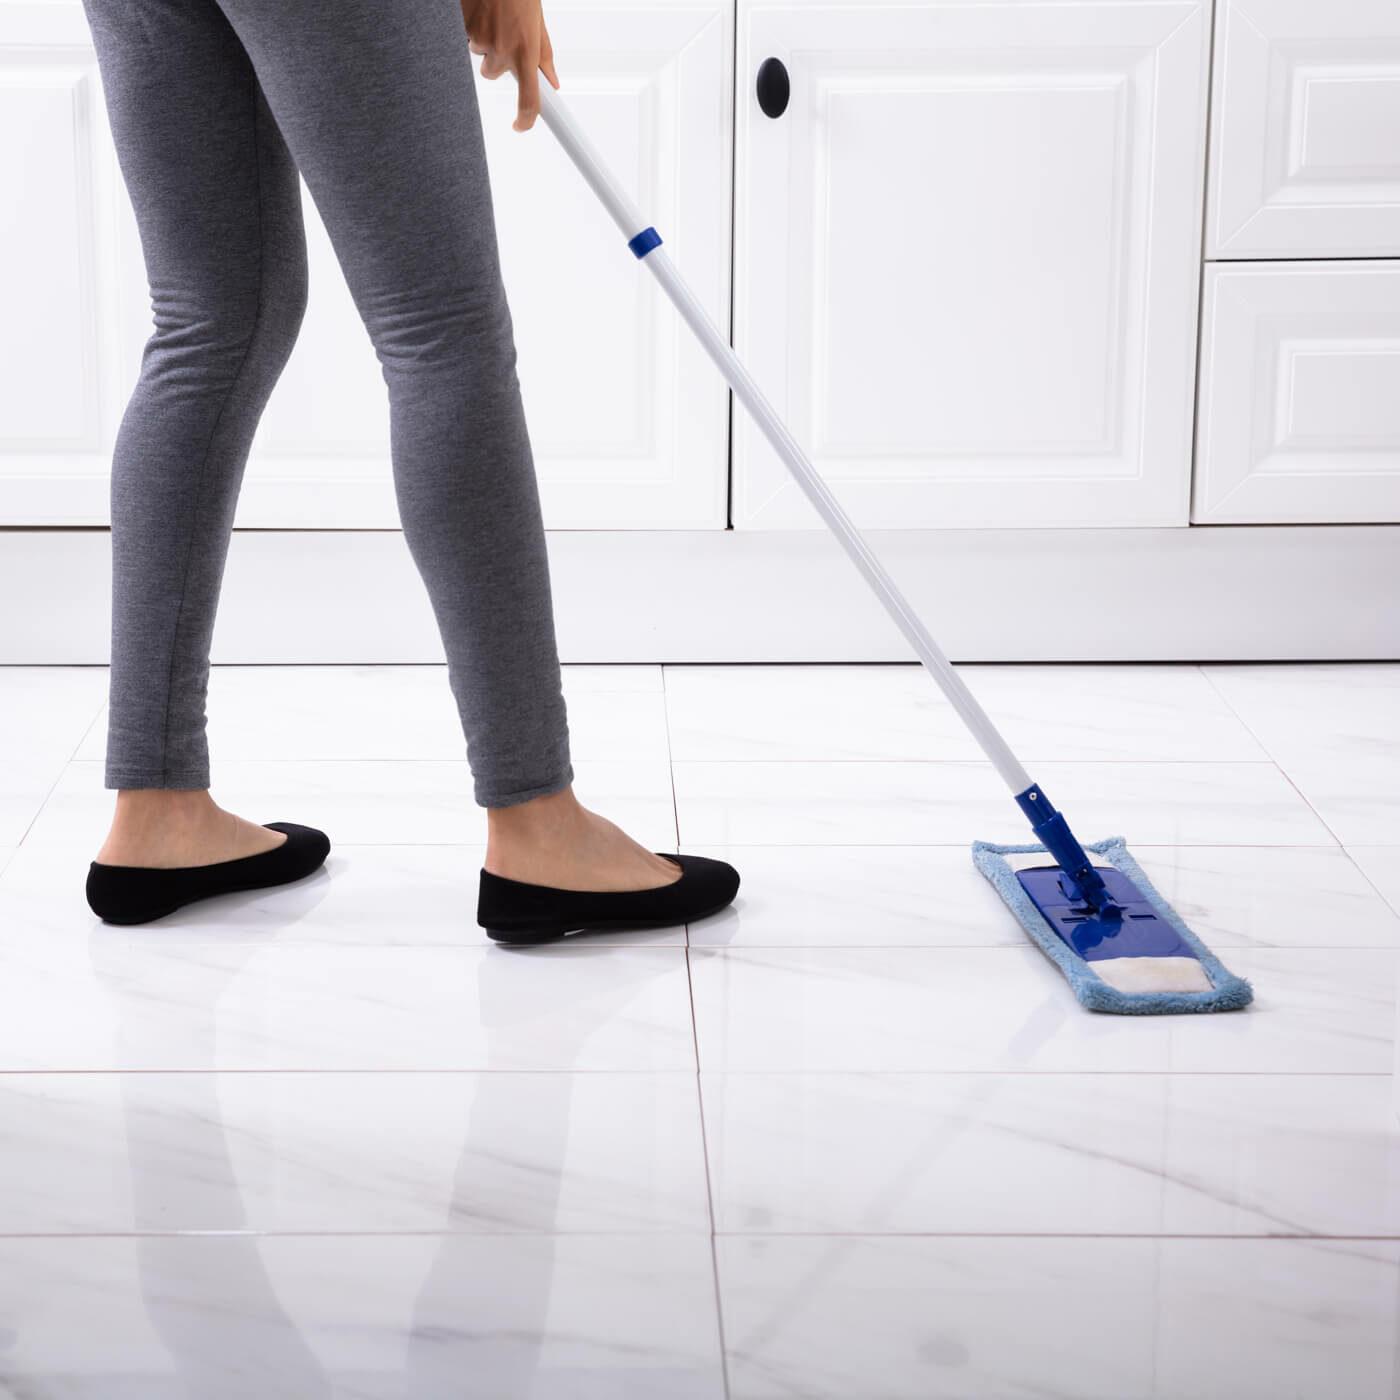 sweep tile   Tish flooring